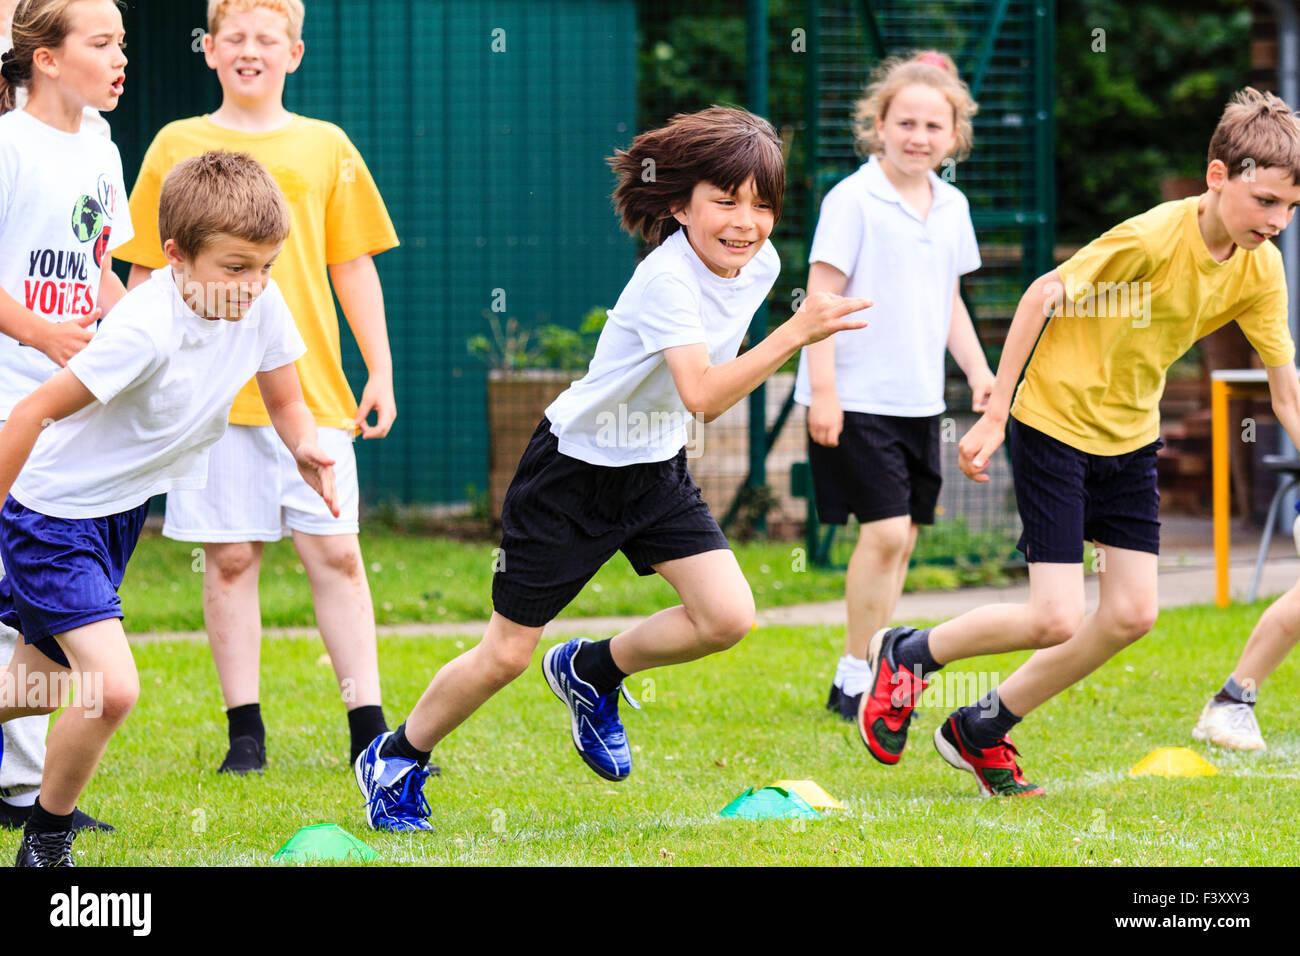 England, school children, boys, 10-11 year old, running race on Stock Photo  - Alamy